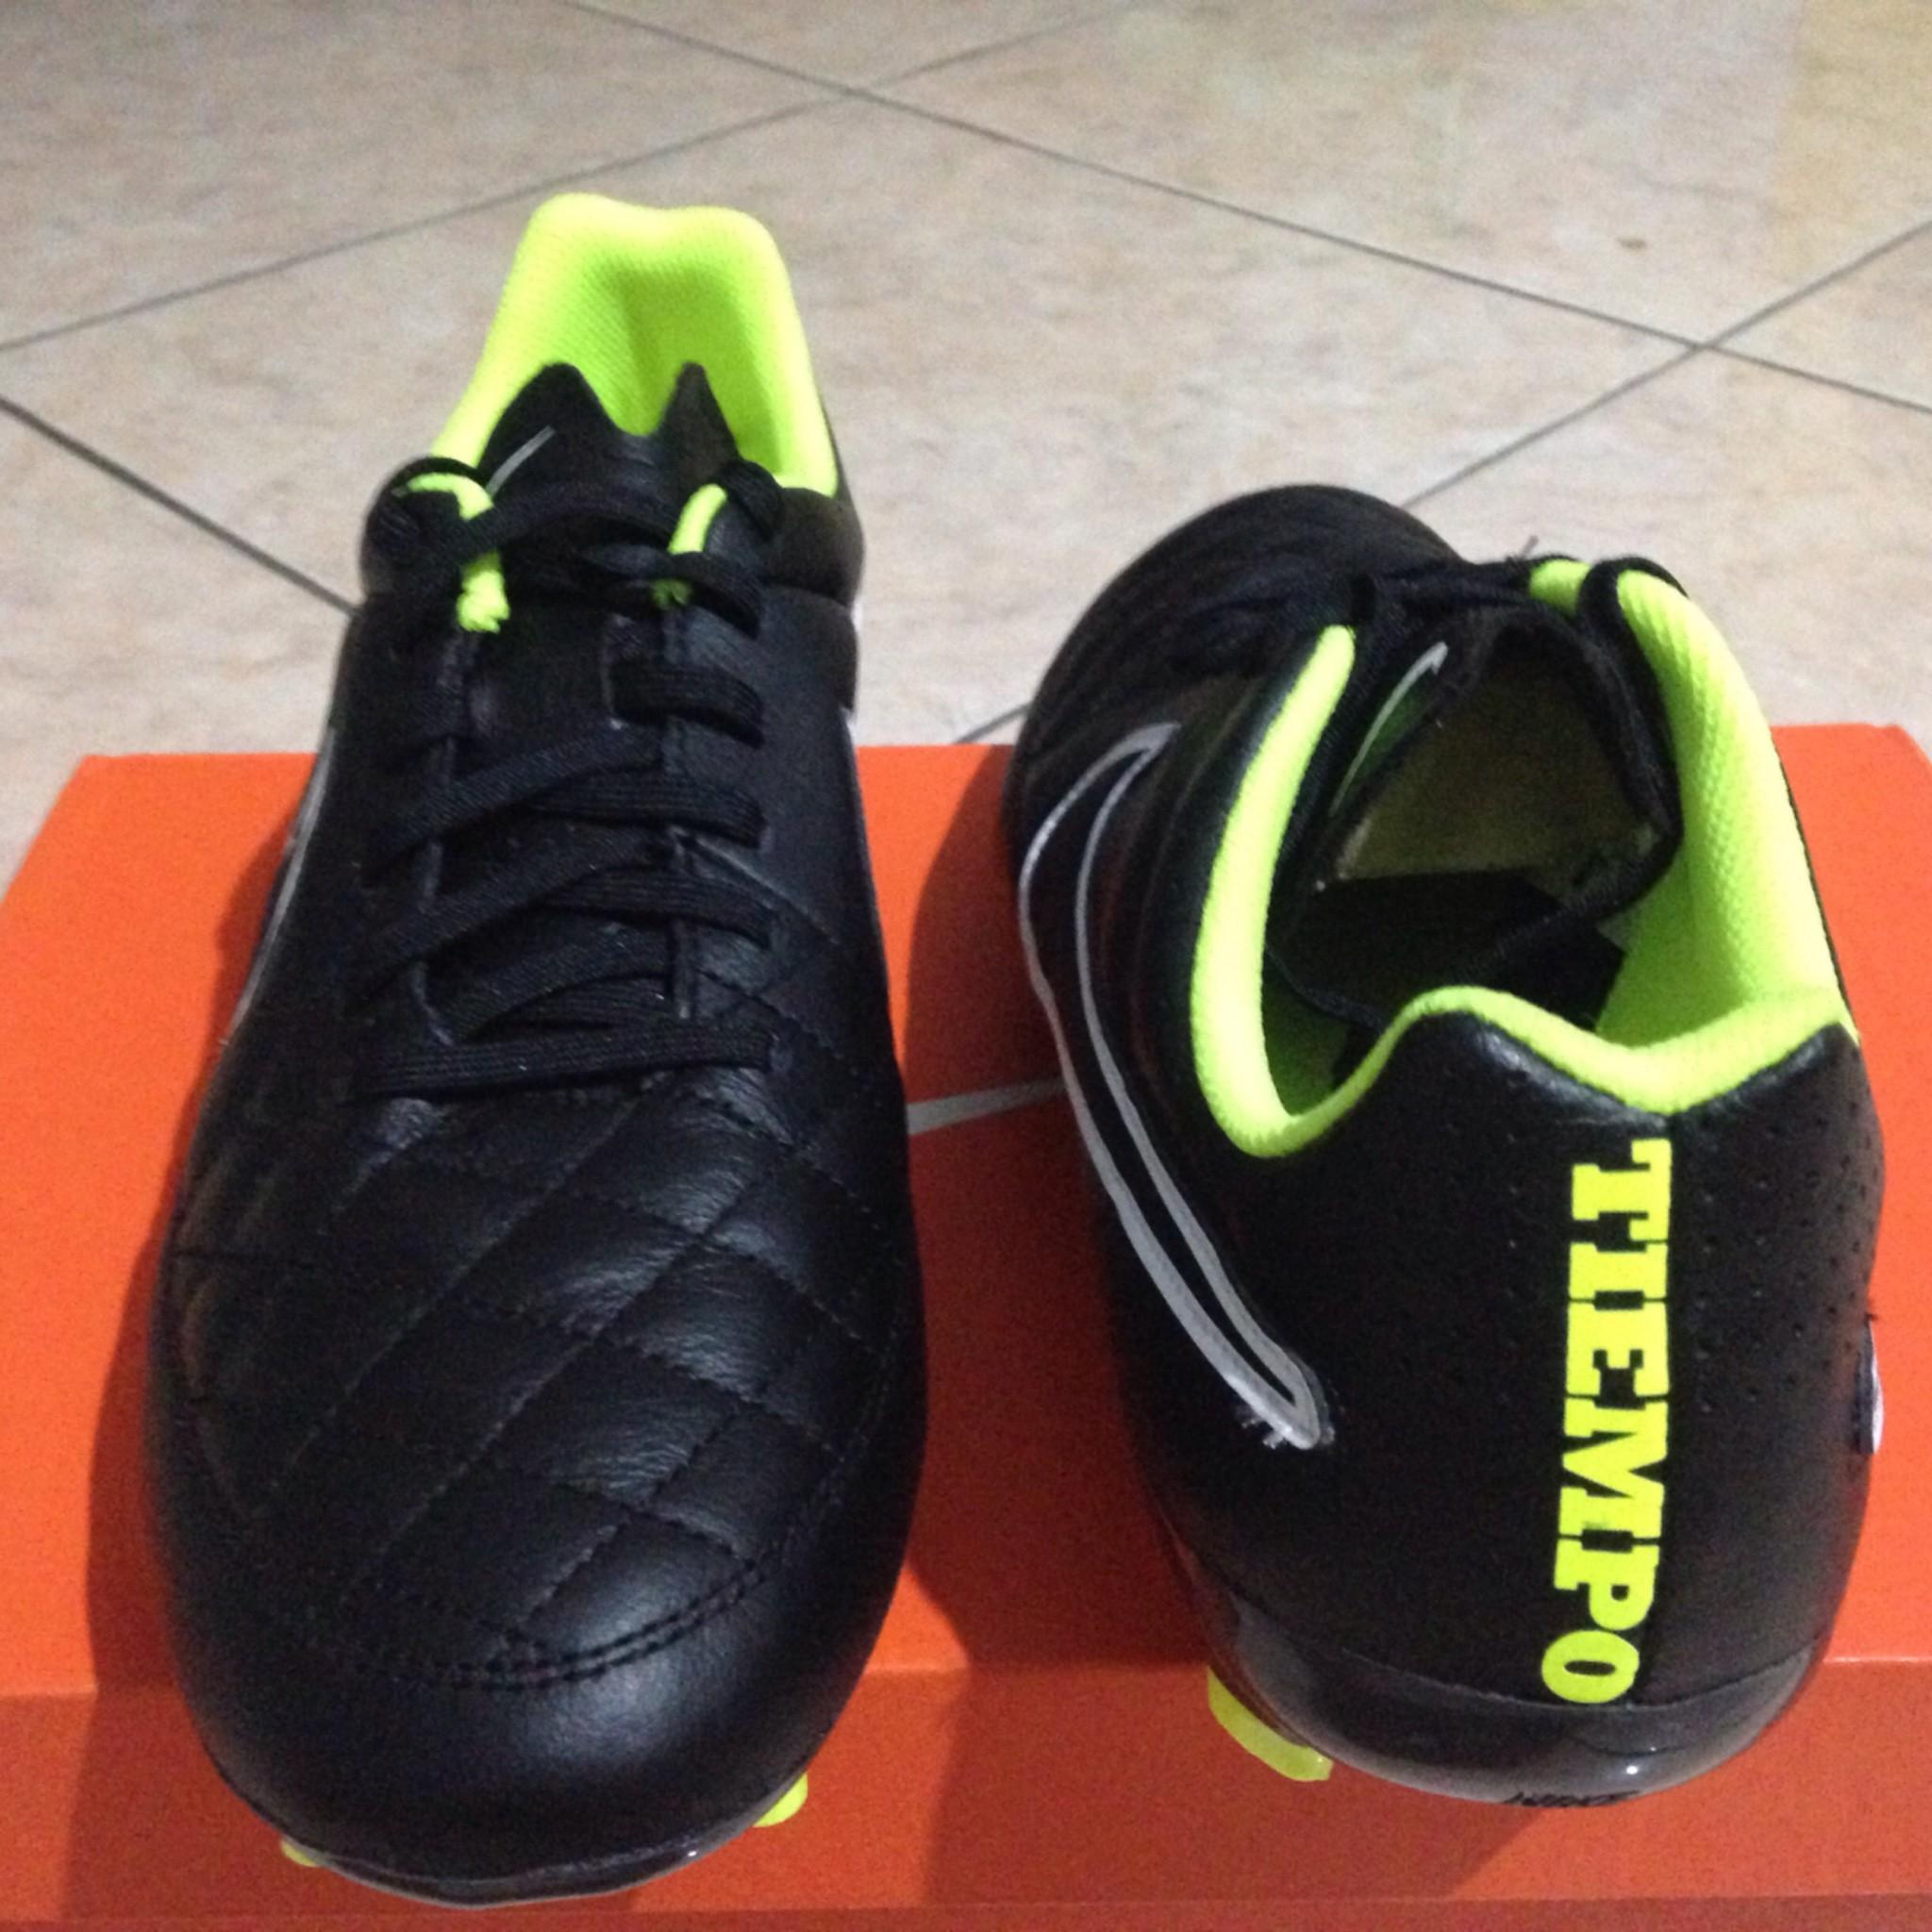 Jual Sepatu Bola Nike Genio Welcome To Tiempox Ii Leather Ic Shoes Hitam Sepak Soccer Tiempo